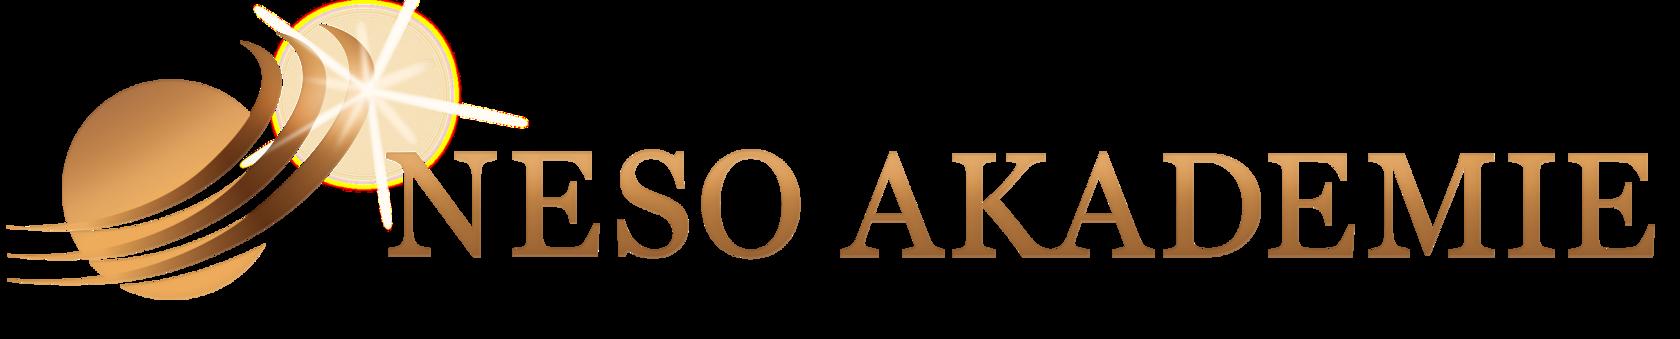 NeSo Akademie